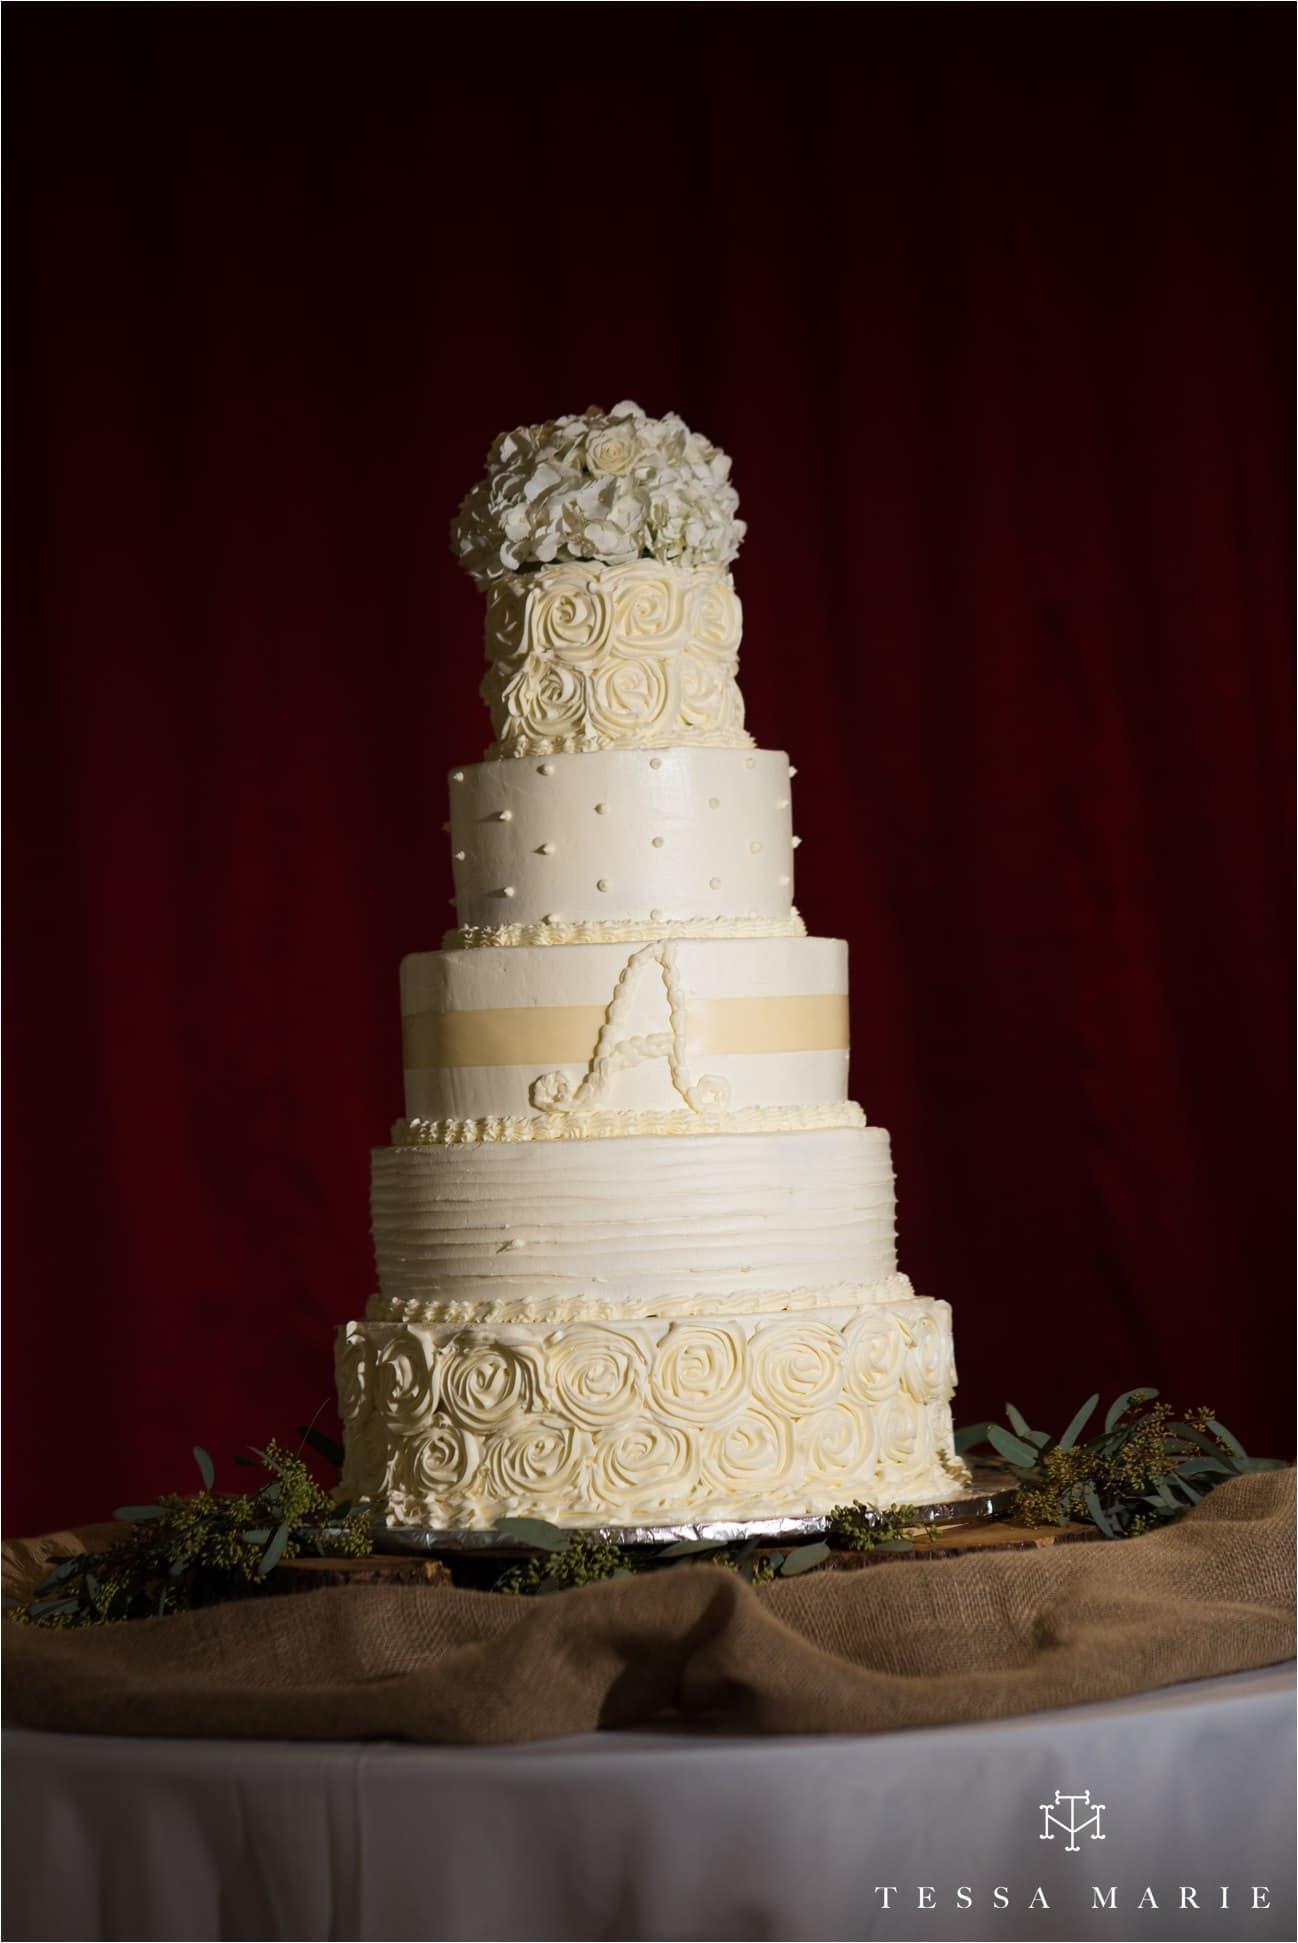 tessa_marie_weddings_wedding_moments_Tessa_marie_studios_0120